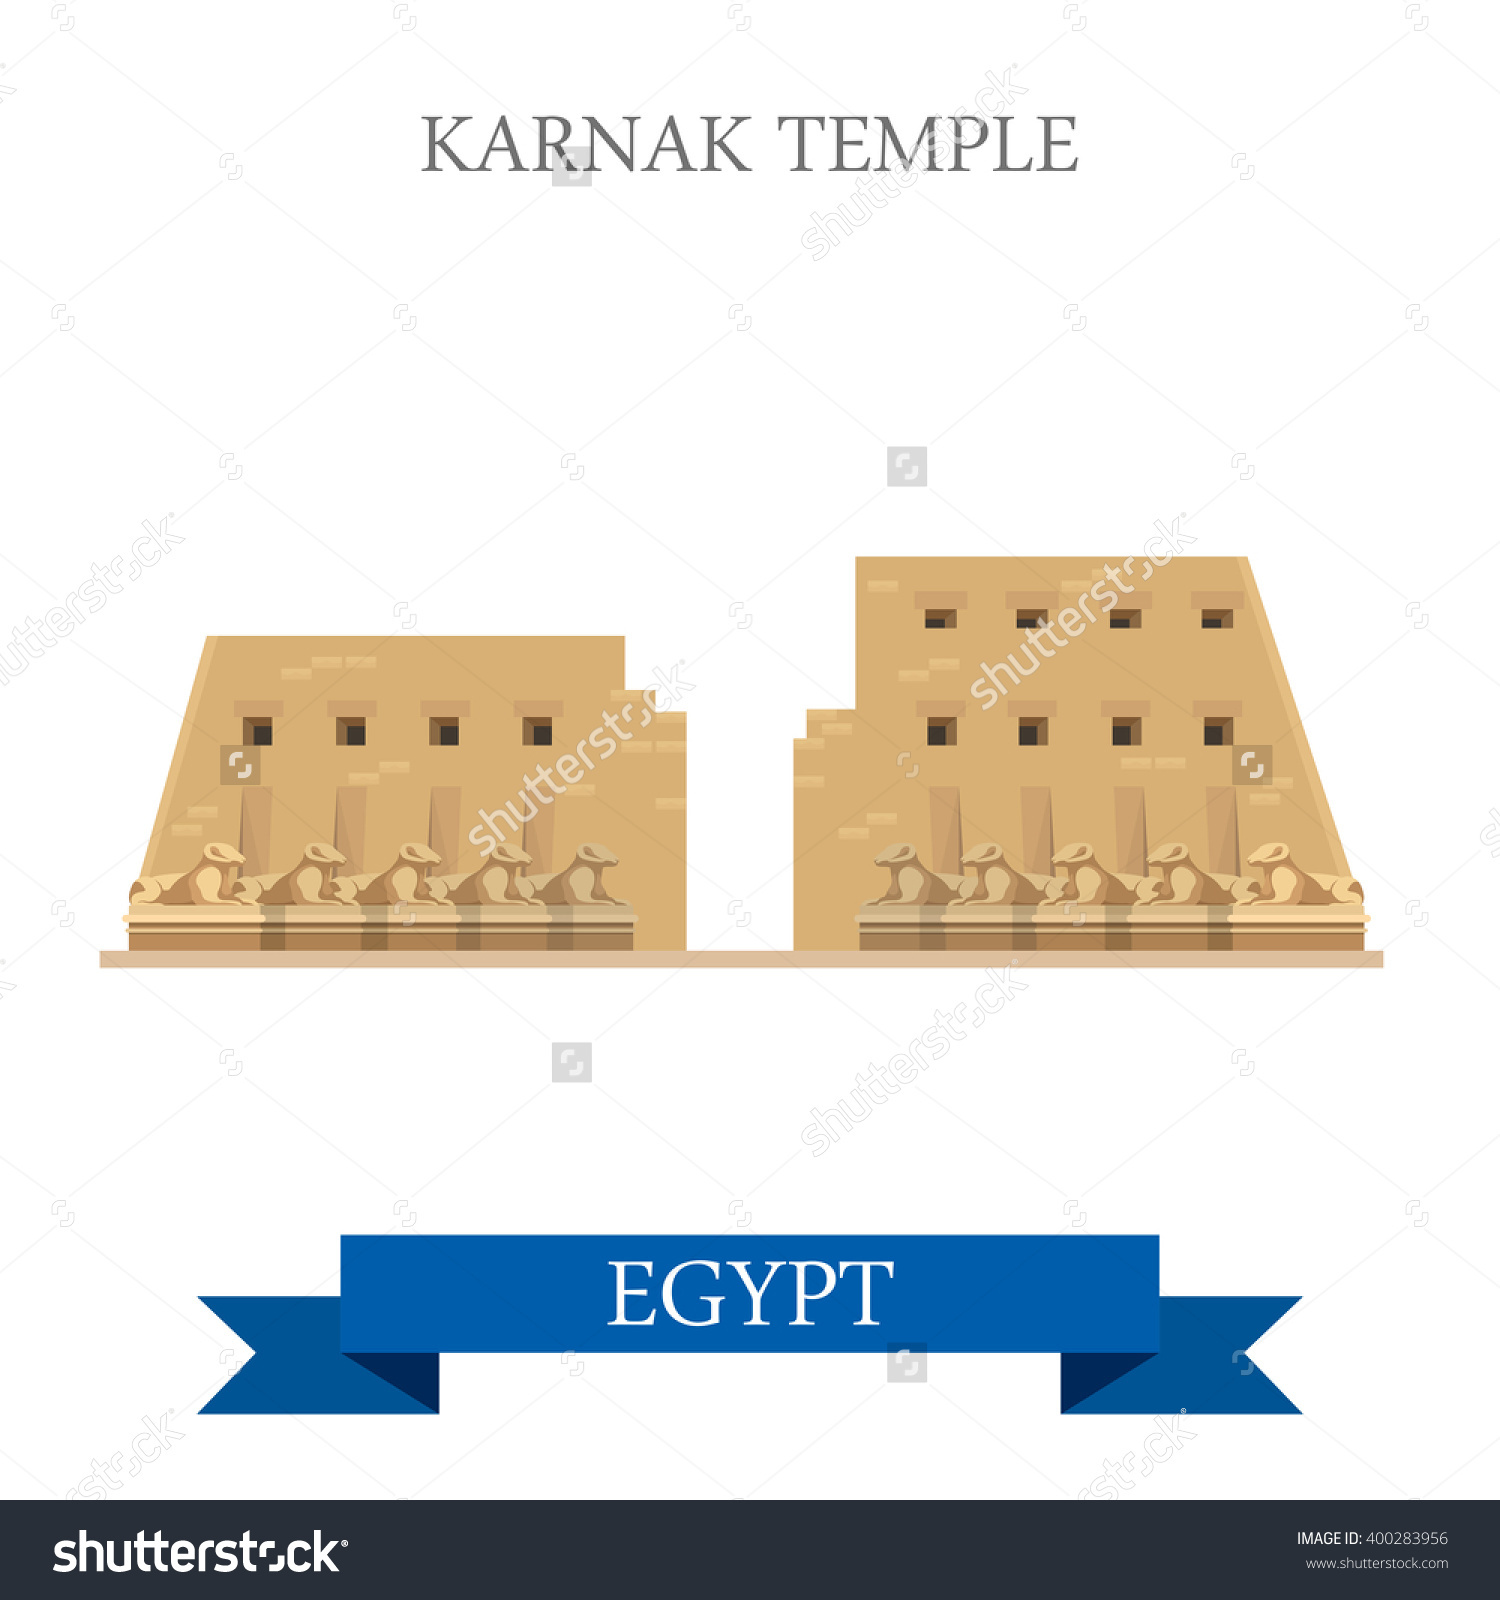 Karnak Temple Luxor Egypt Flat Cartoon Stock Vector 400283956.